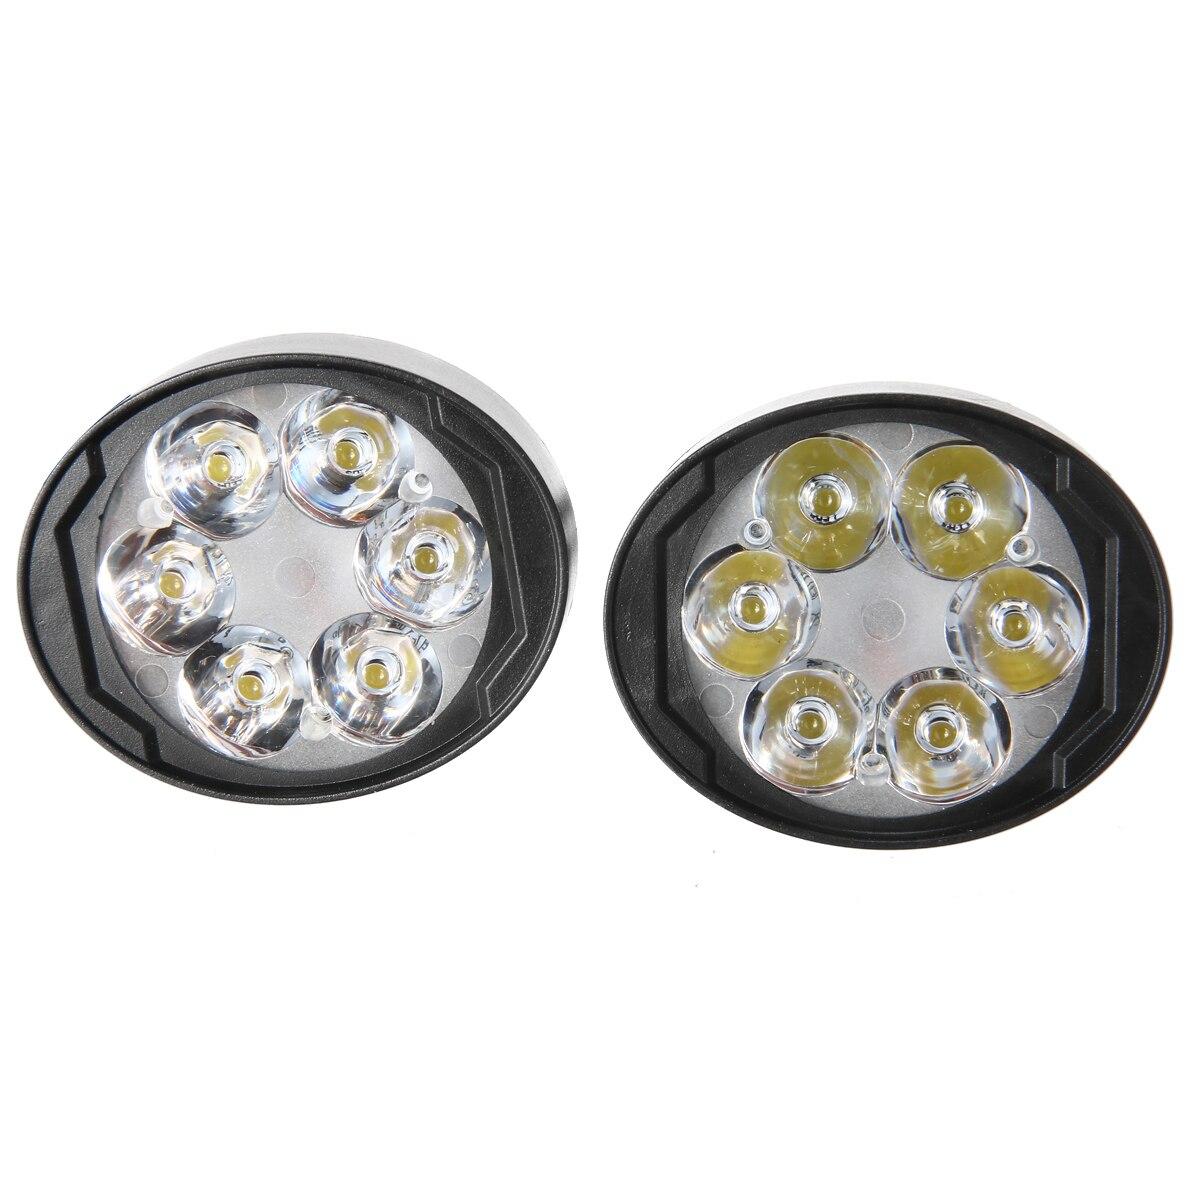 1Pair 6LED White Motorcycle Spot Fog Light Front Headlight Assist Lamp ABS Plastic Metal Stem Waterproof 6000-6500K For Honda